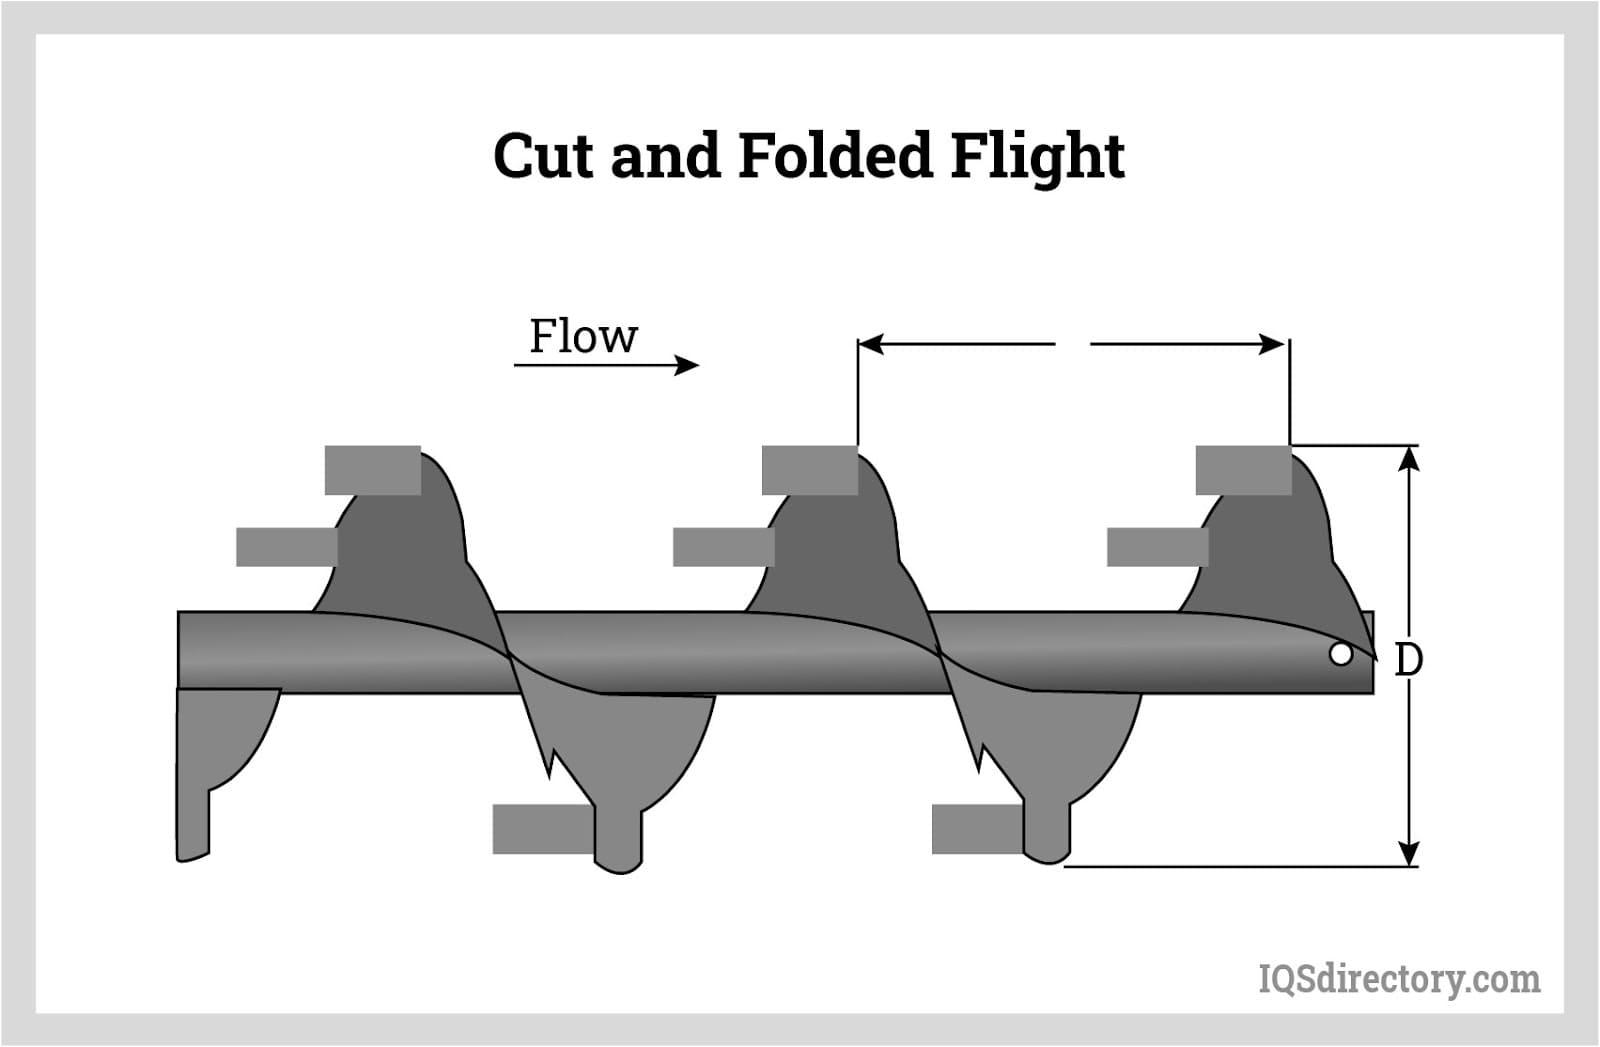 Cut and Folded Flight